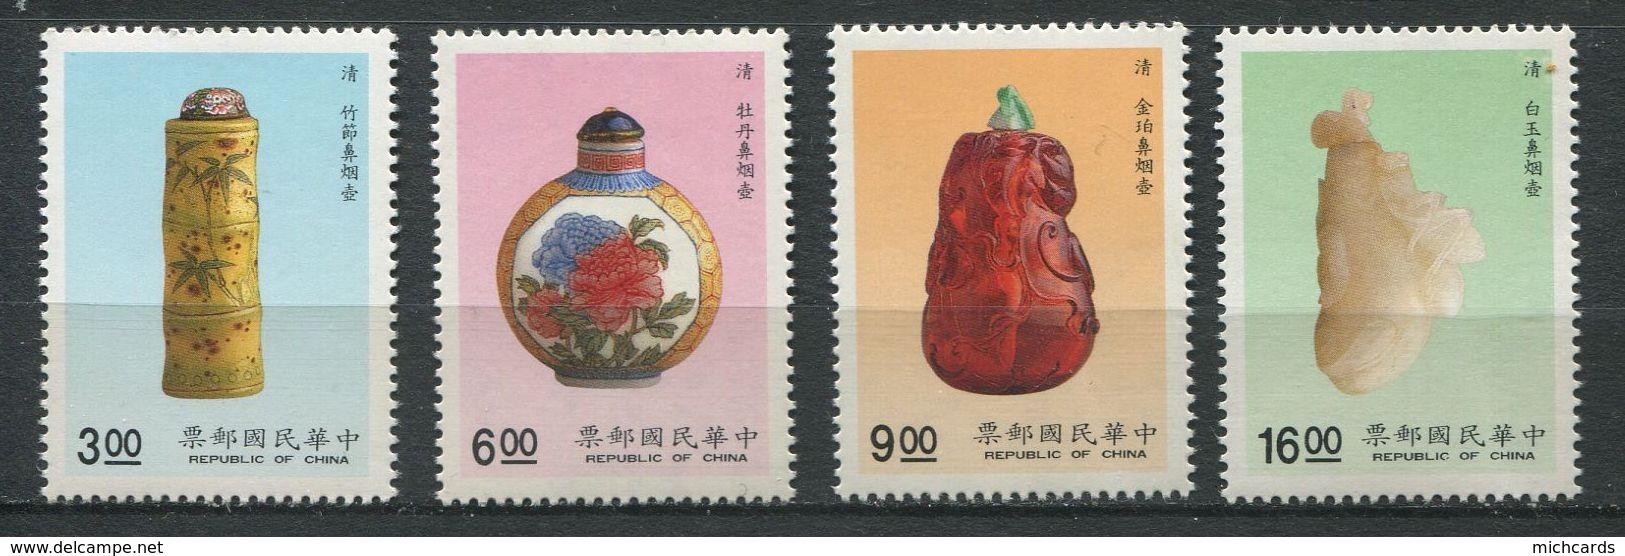 254 FORMOSE 1990 - Yvert 1854/57 - Tabatiere - Neuf ** (MNH) Sans Trace De Charniere - 1945-... Republiek China